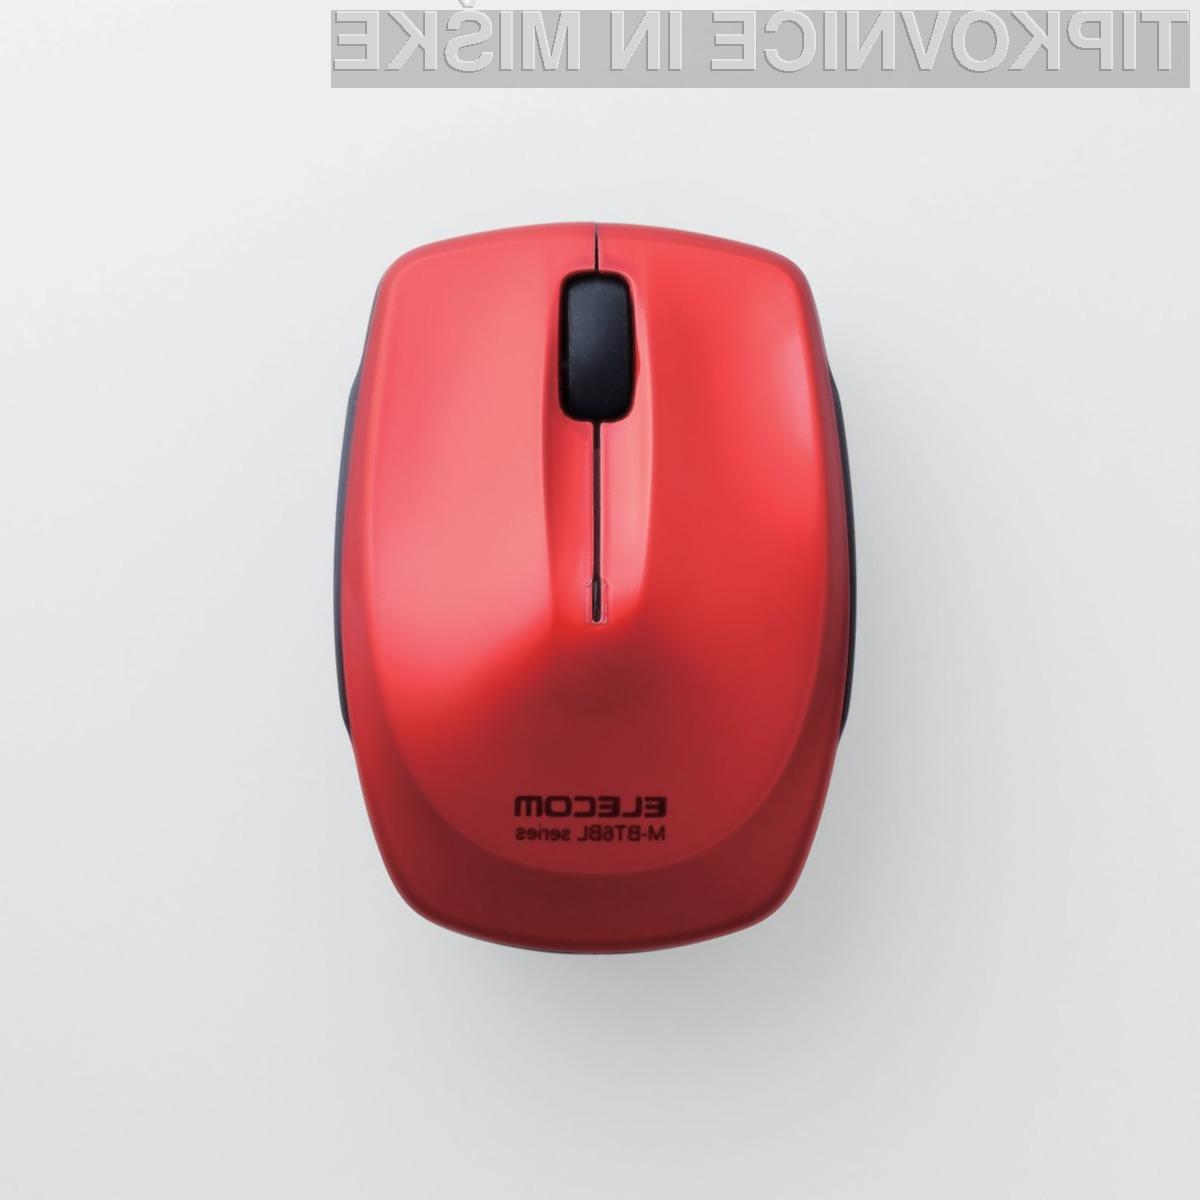 Laserske računalniške miške Elecom družine »M-BT6BL Series«  so pisane na kožo novejšim prenosnikom.